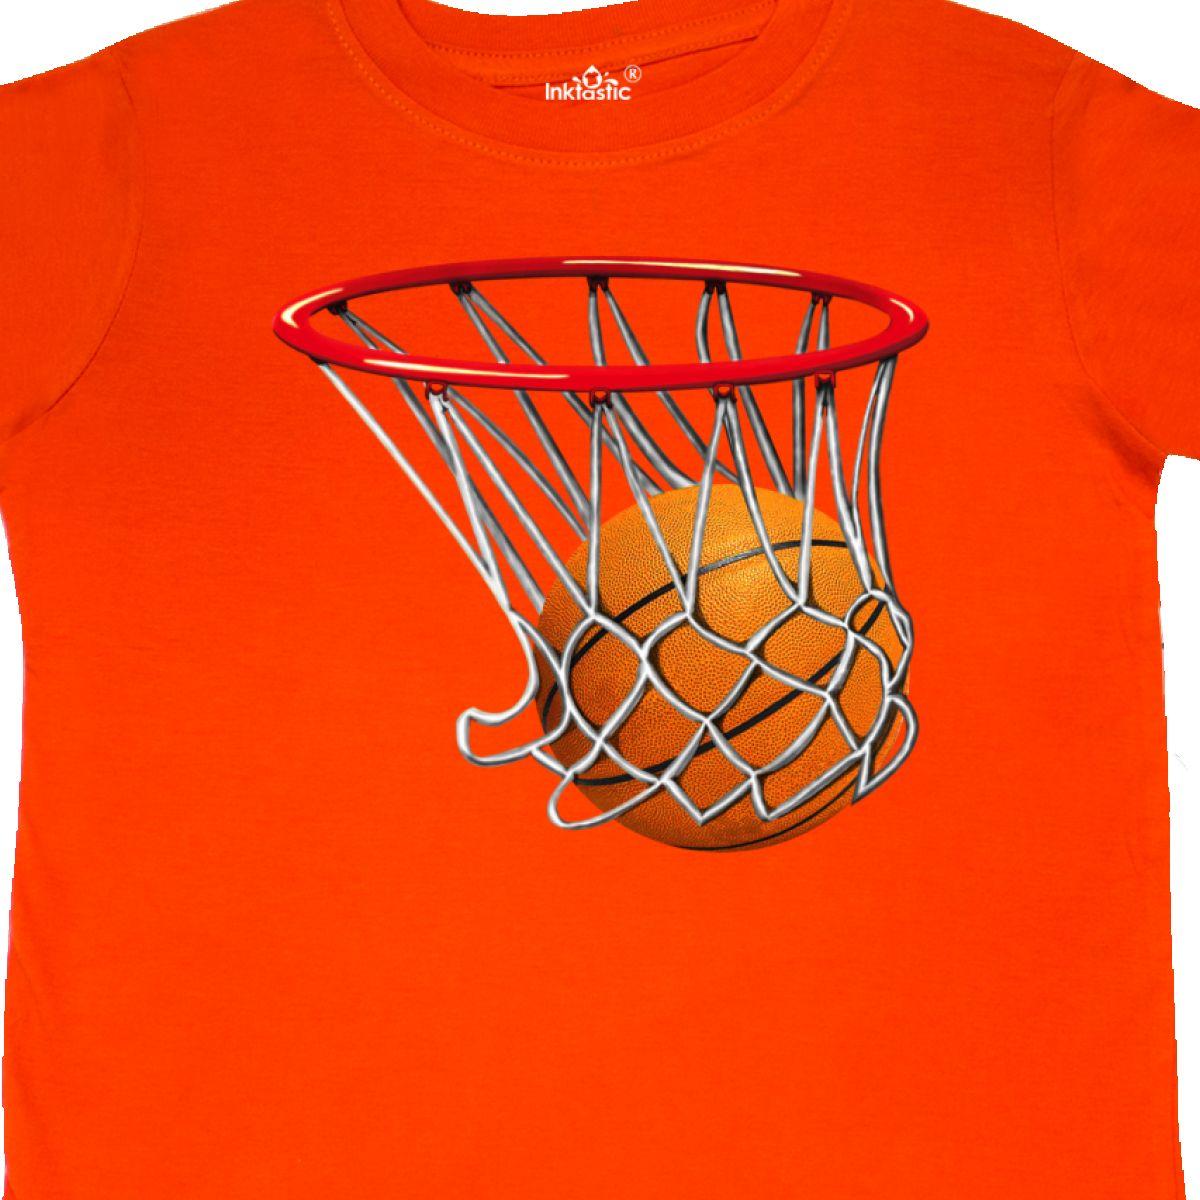 Inktastic Basketball Swish Toddler T-Shirt Hoop Shoot Hoops Bball Athletic Ball